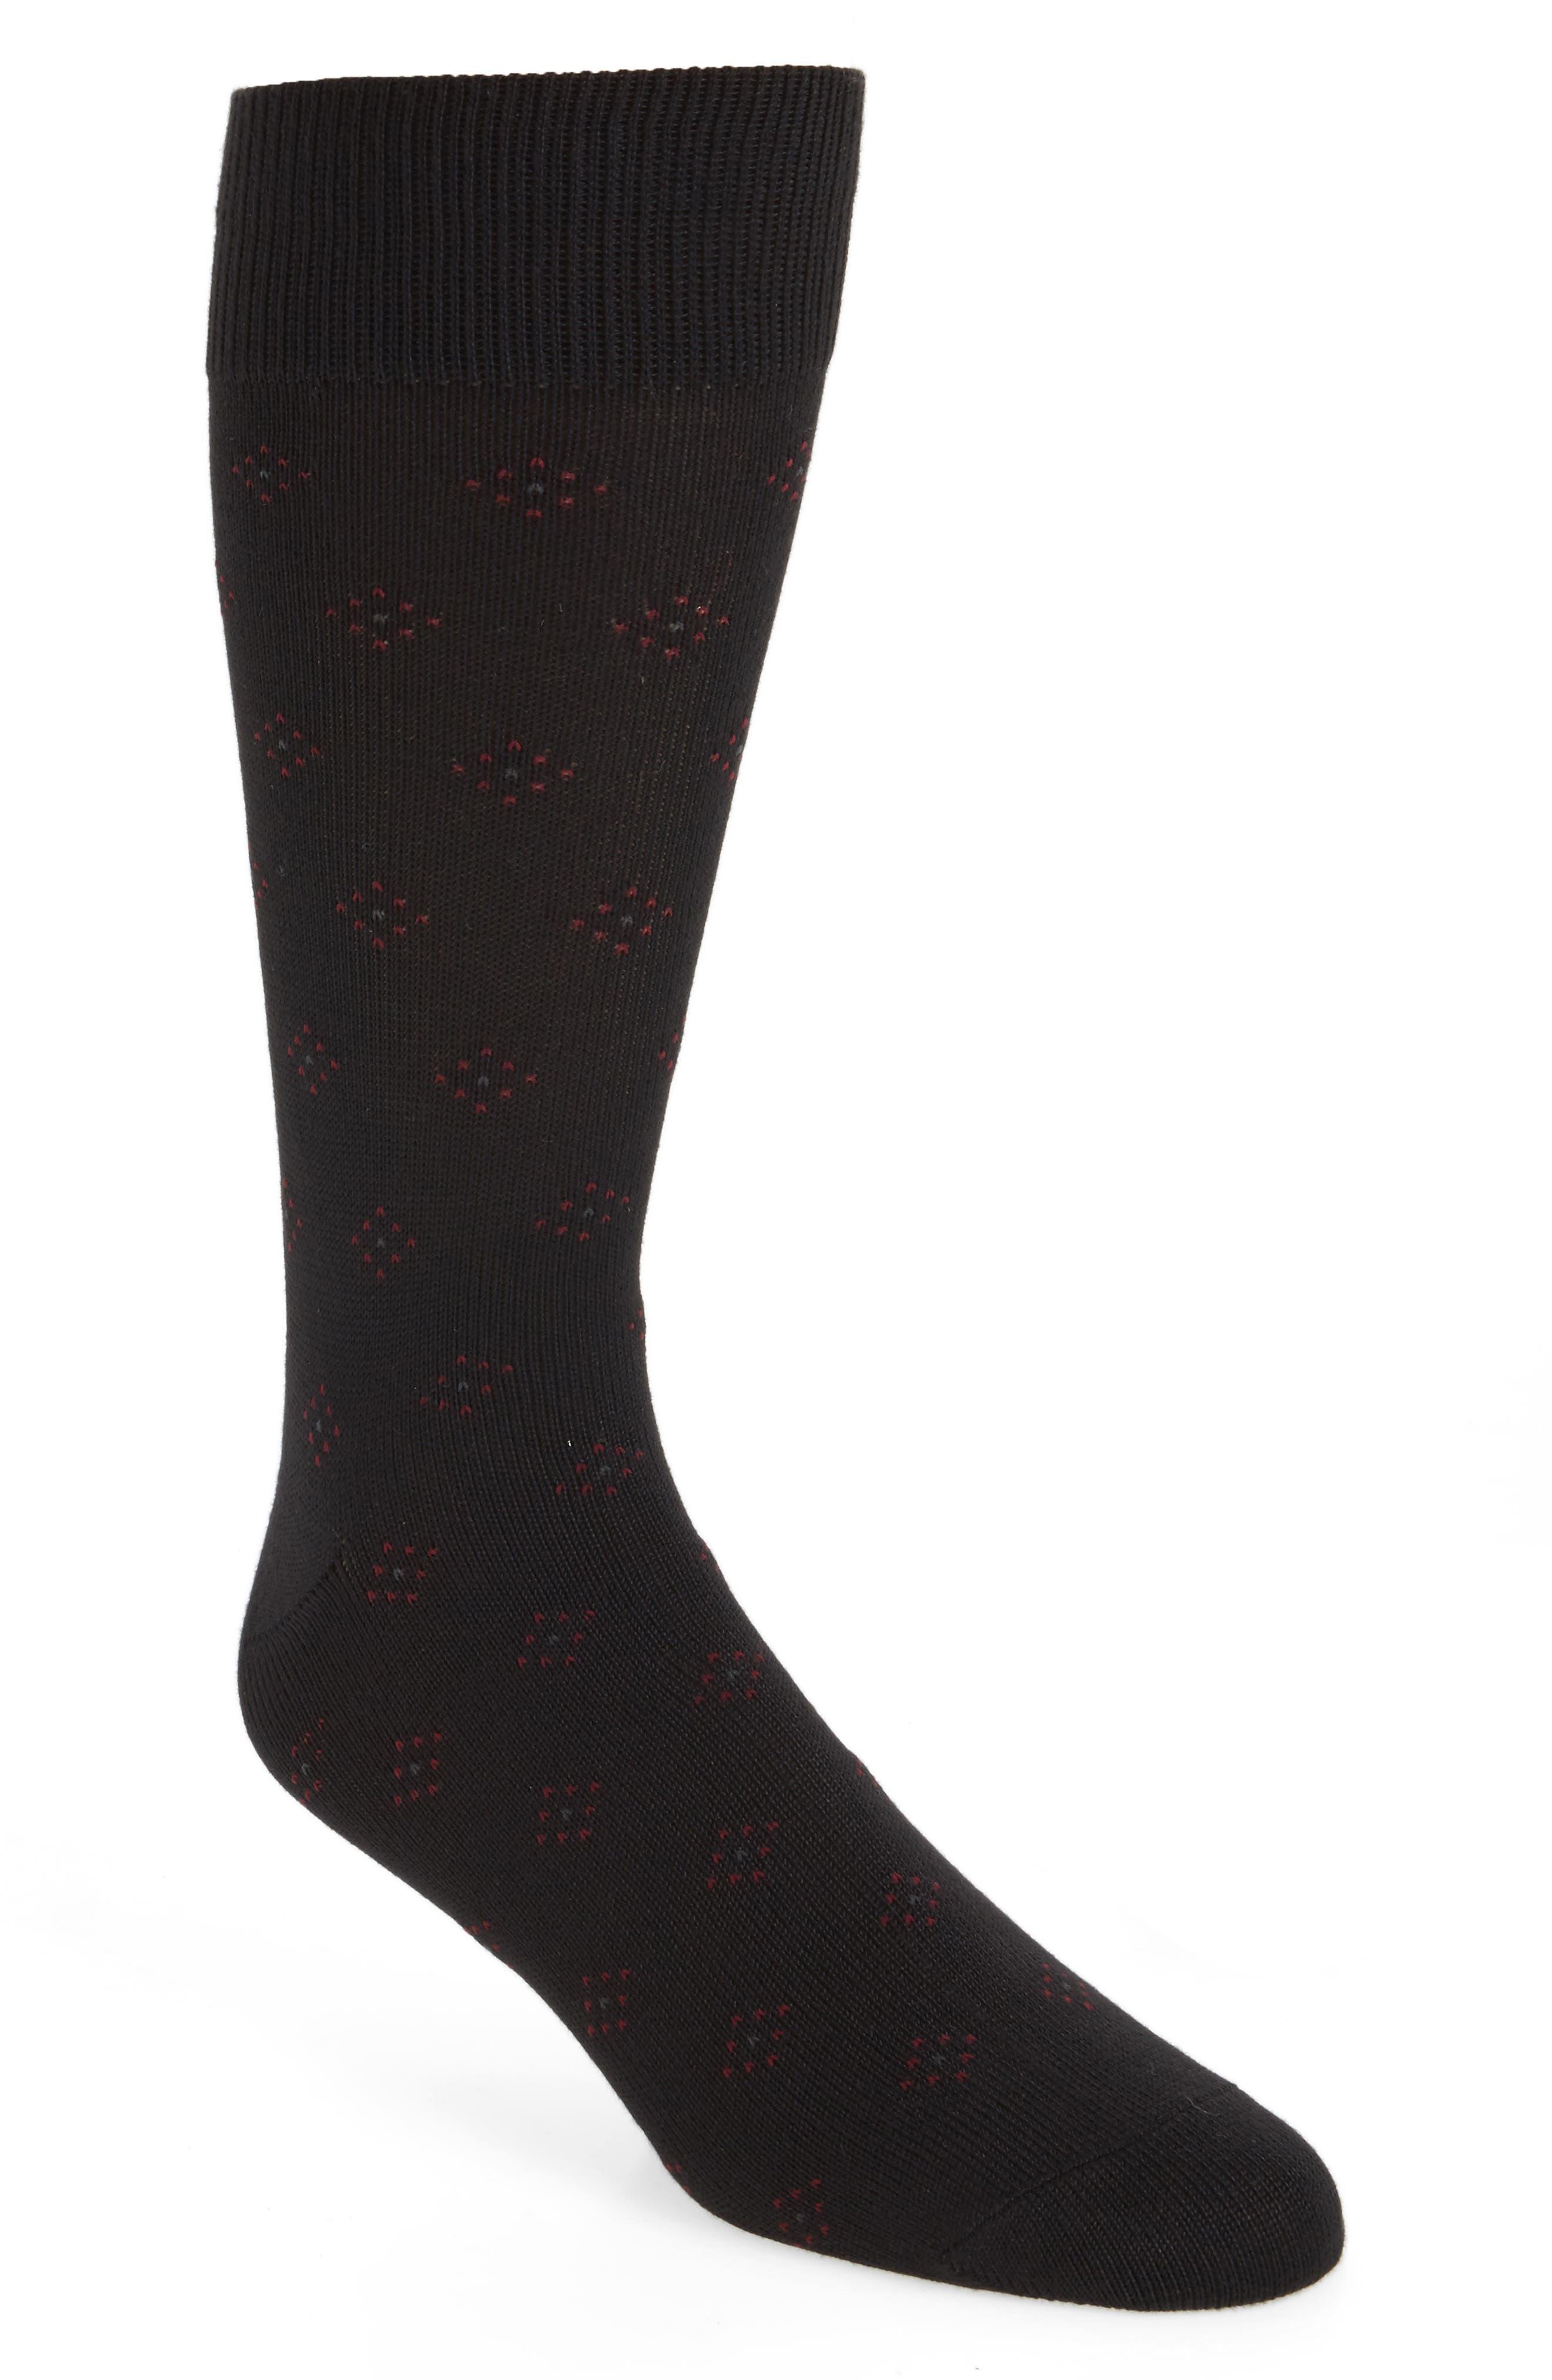 Ultra Soft Neat Socks,                             Main thumbnail 1, color,                             001